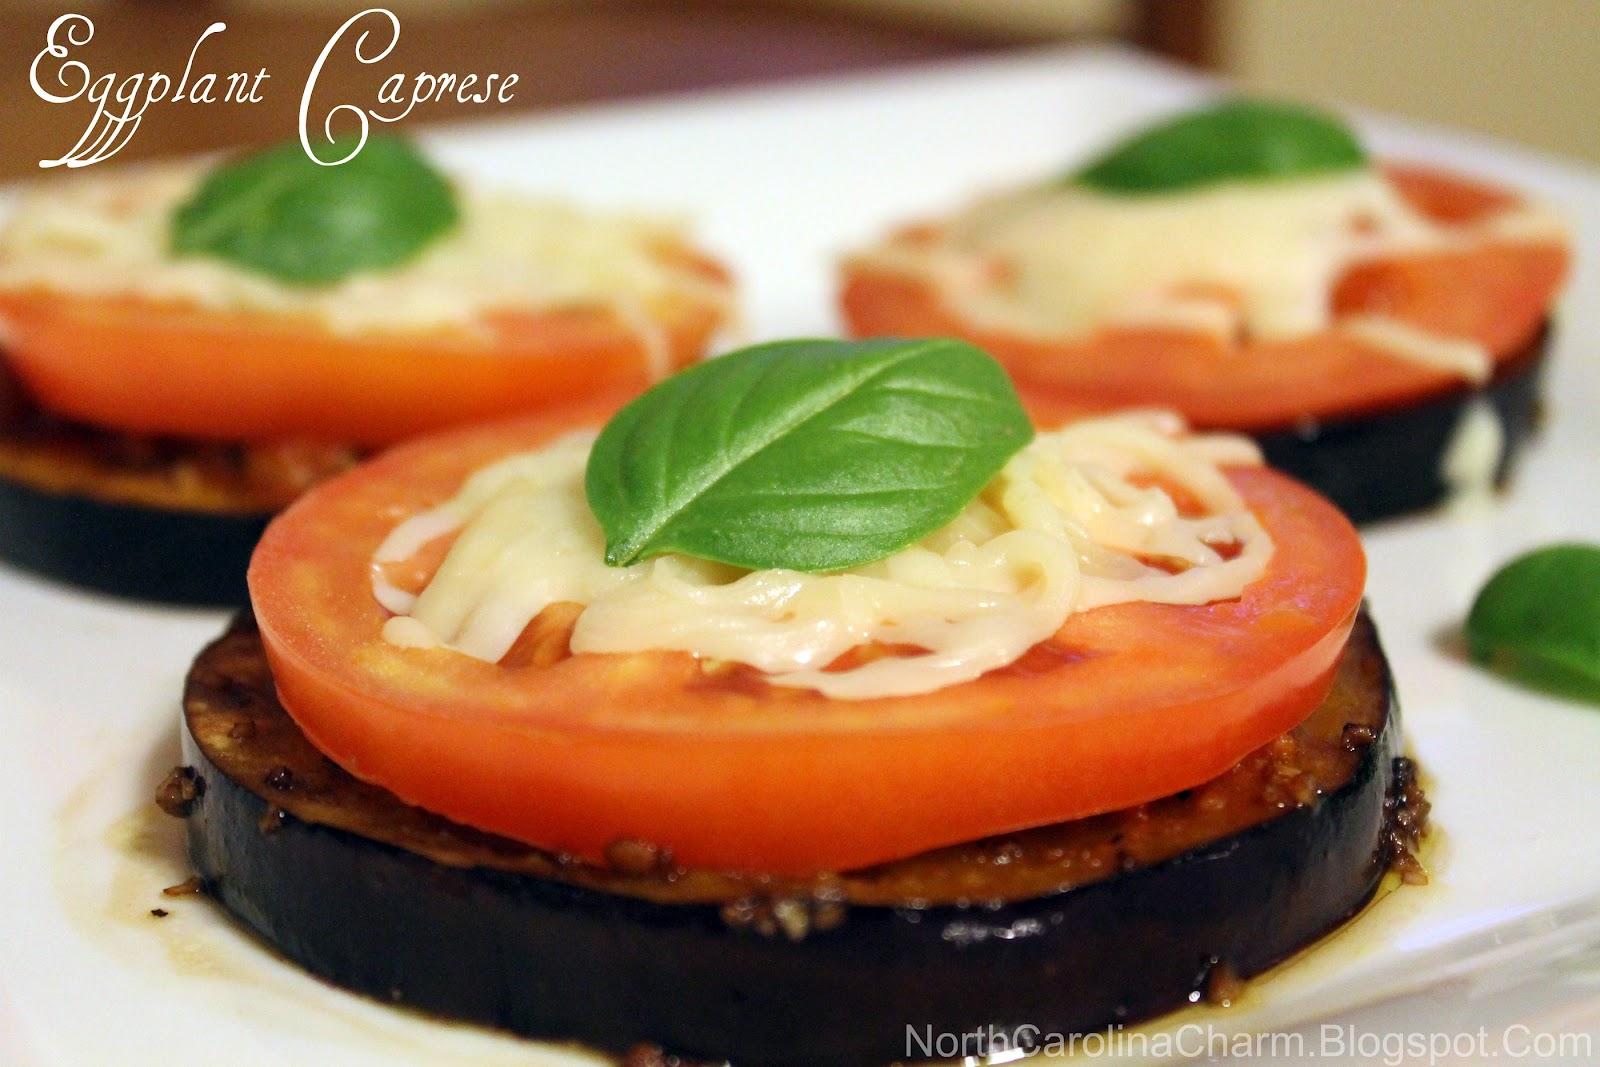 Carolina Charm: Eggplant Caprese